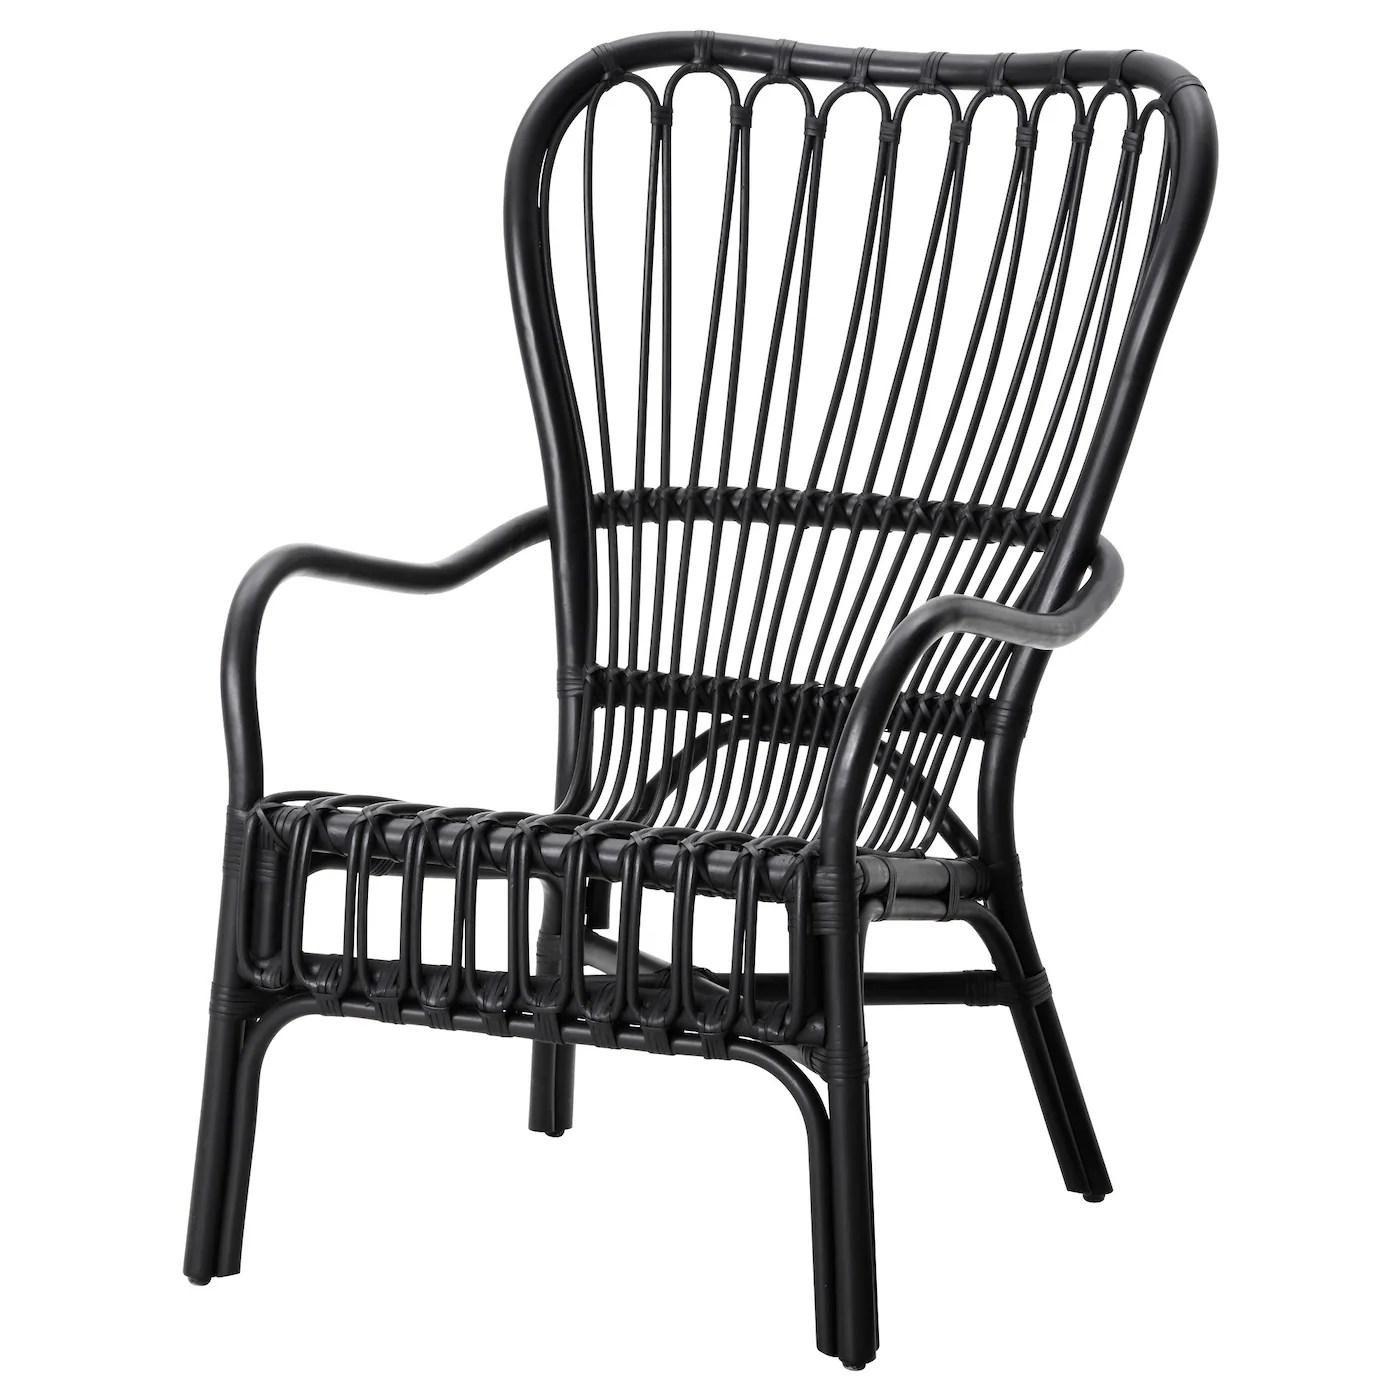 ikea high chairs modern kitchen table and rattan wicker ireland dublin